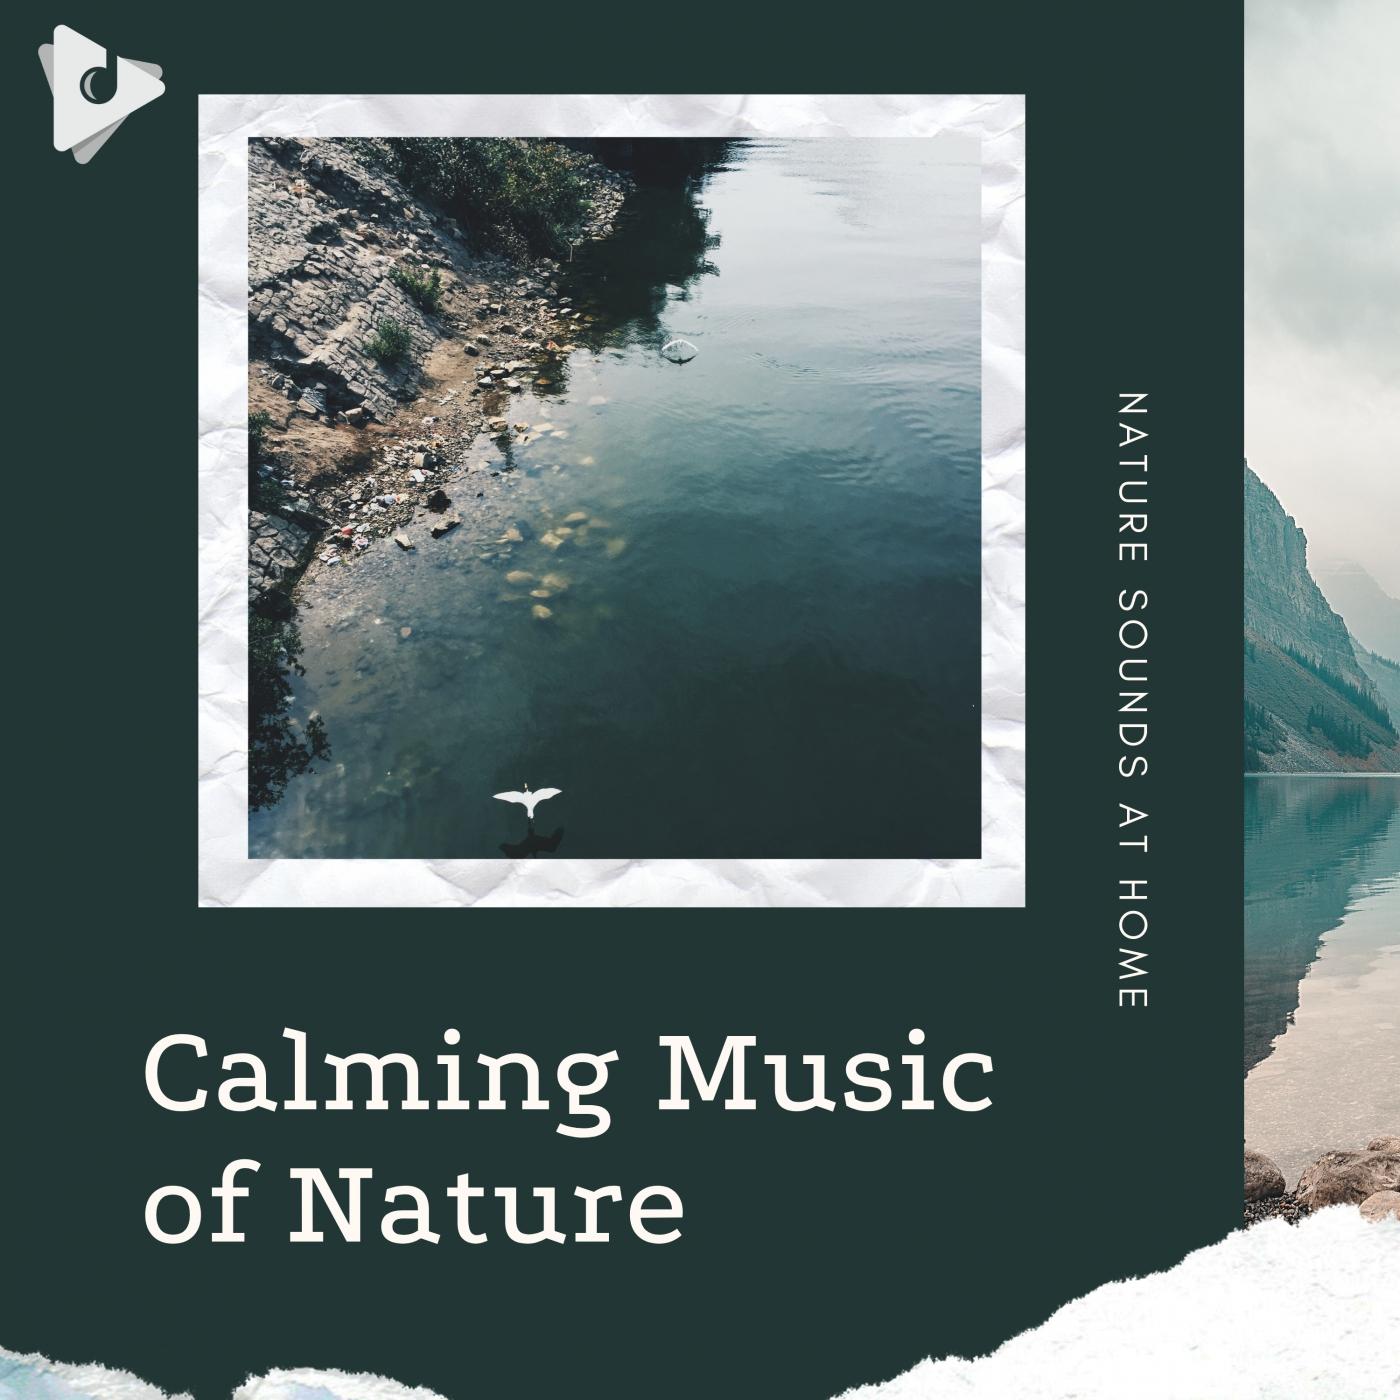 Calming Music of Nature